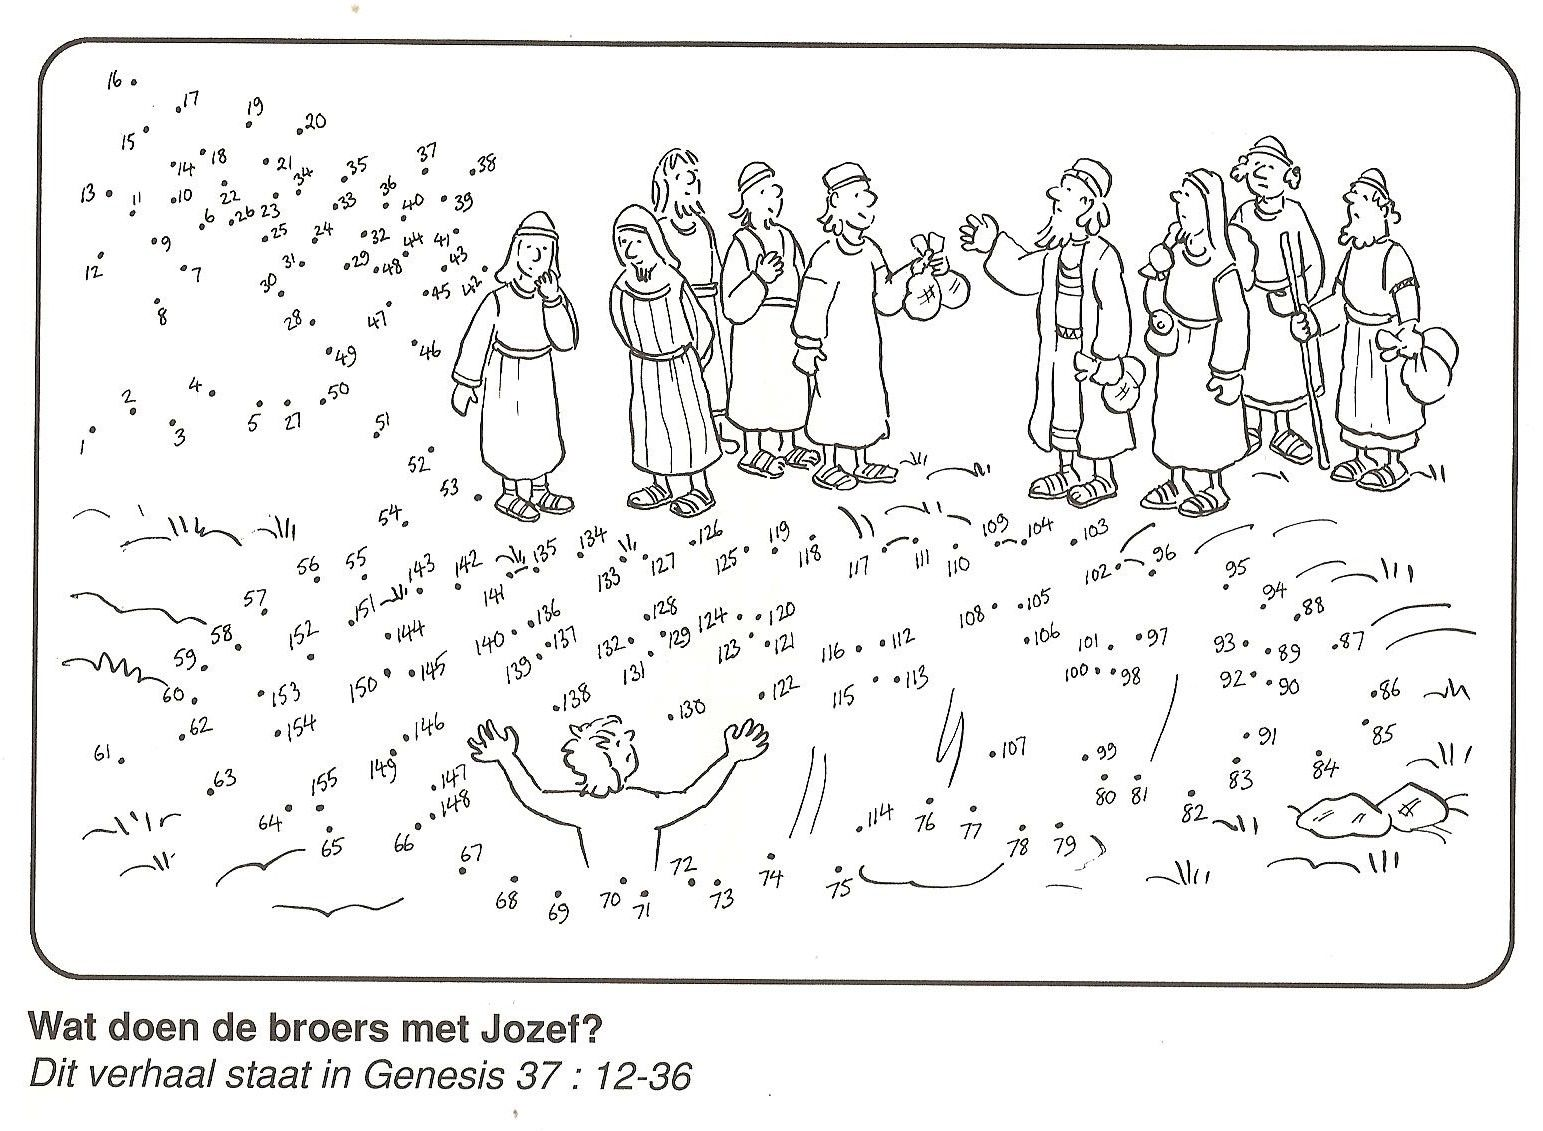 Joseph Thrown Into The Pit Genesis 37 Dot To Dot Printable